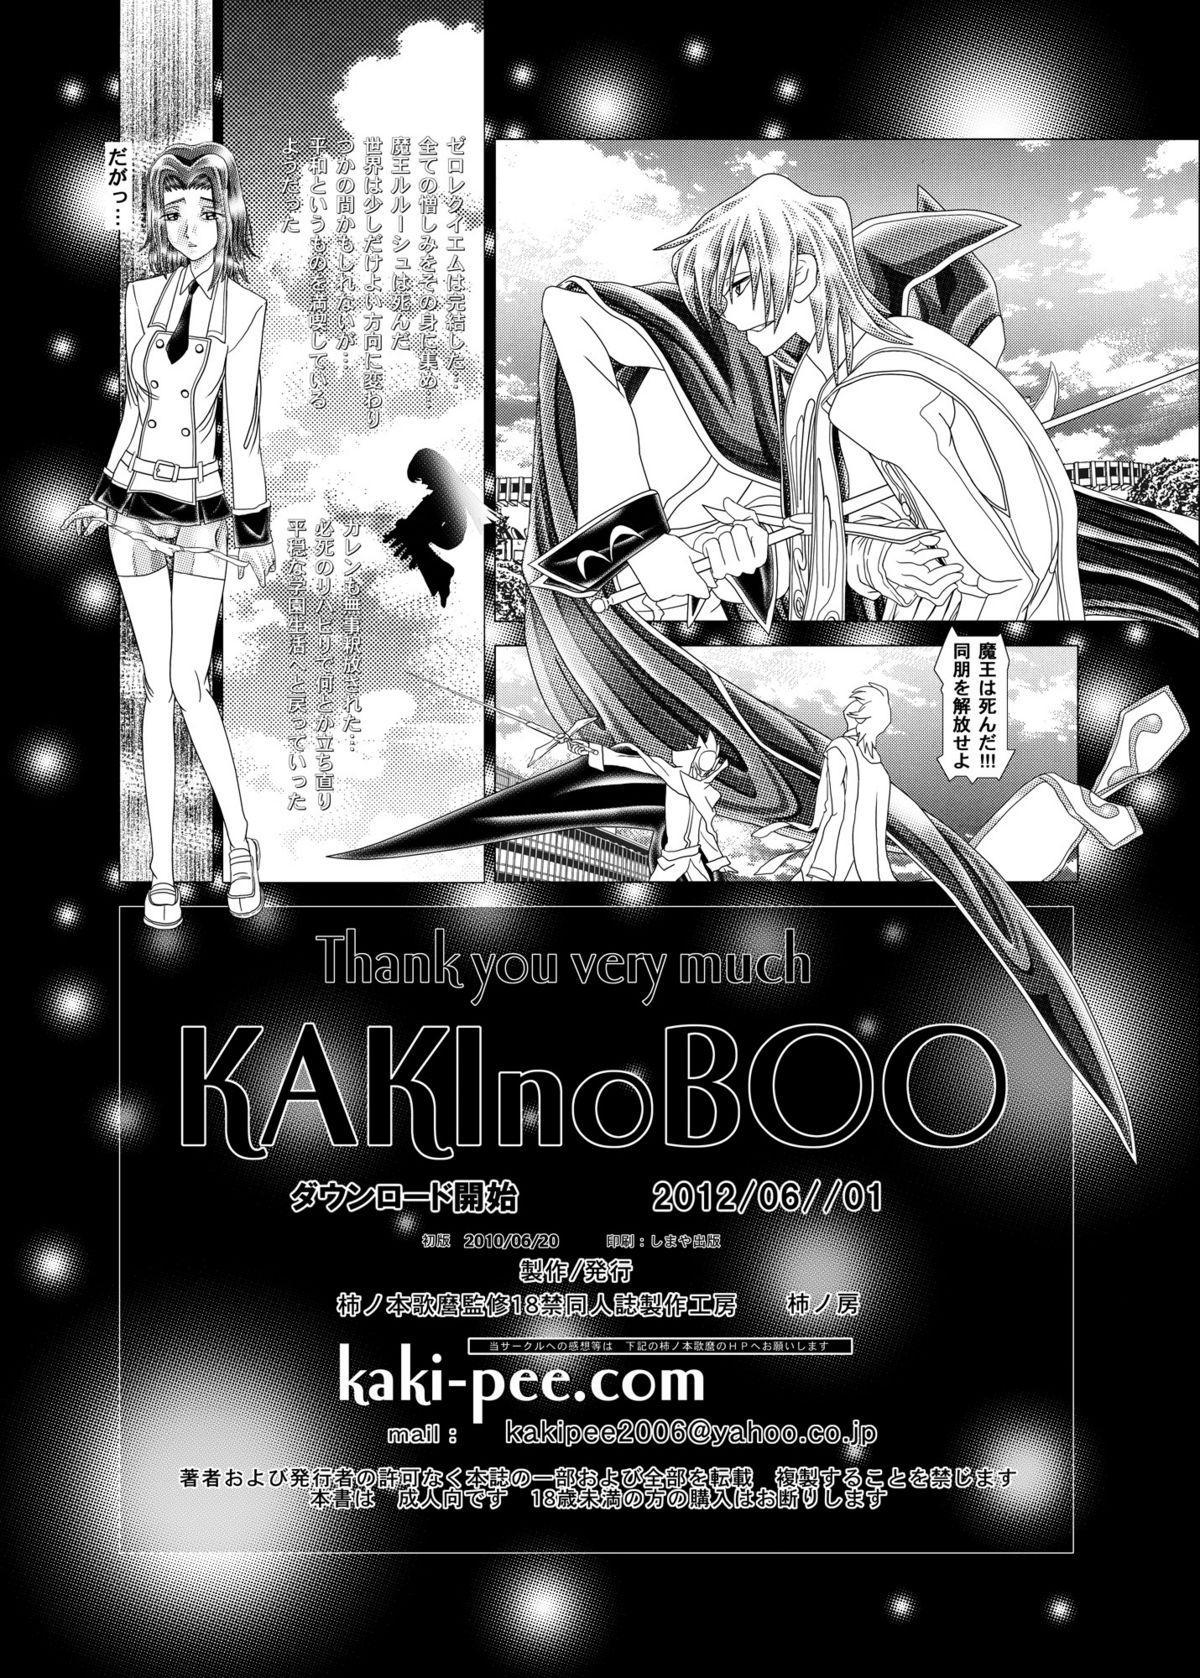 [Kaki no Boo (Kakinomoto Utamaro)] Karen - R22 of the Cord Eros - Infringement (Code Geass) [Digital] 26